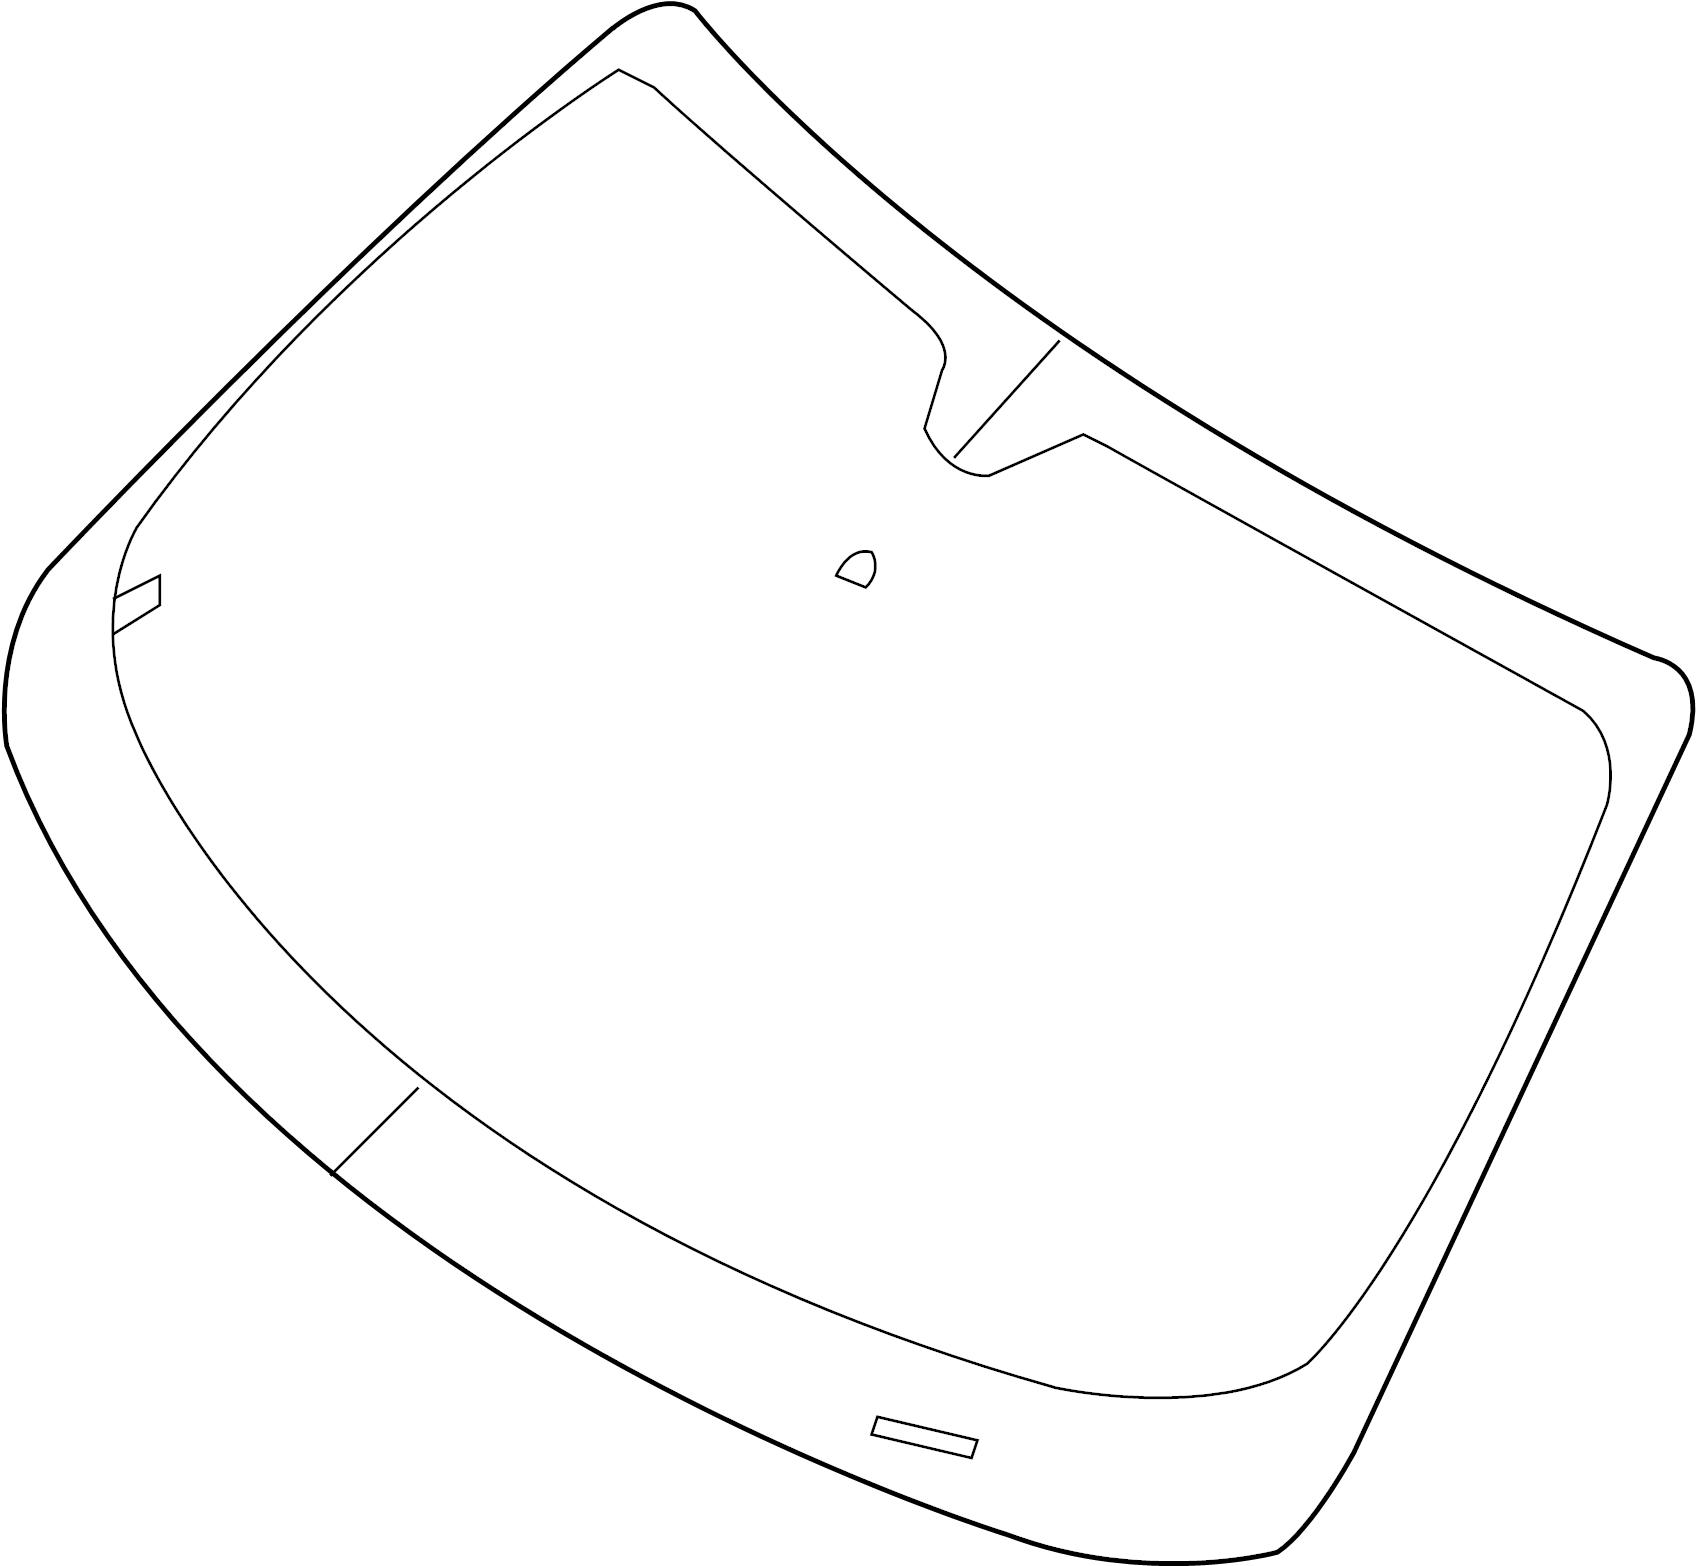 2016 Dodge Challenger Windshield. Windshield Glass. Front